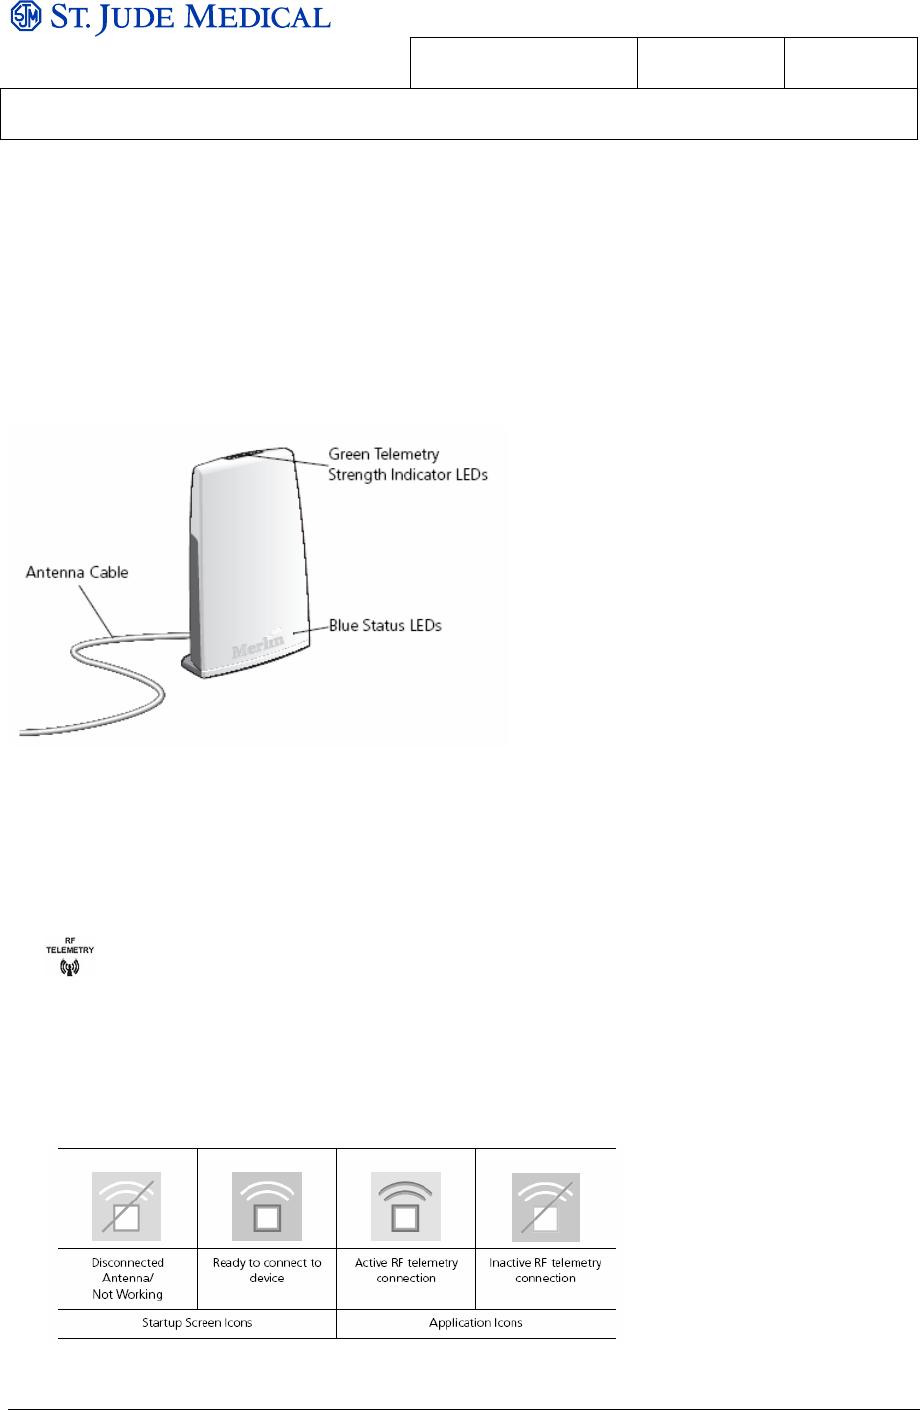 St Jude Medical SJMRFANT Merlin Antenna 3638 User Manual